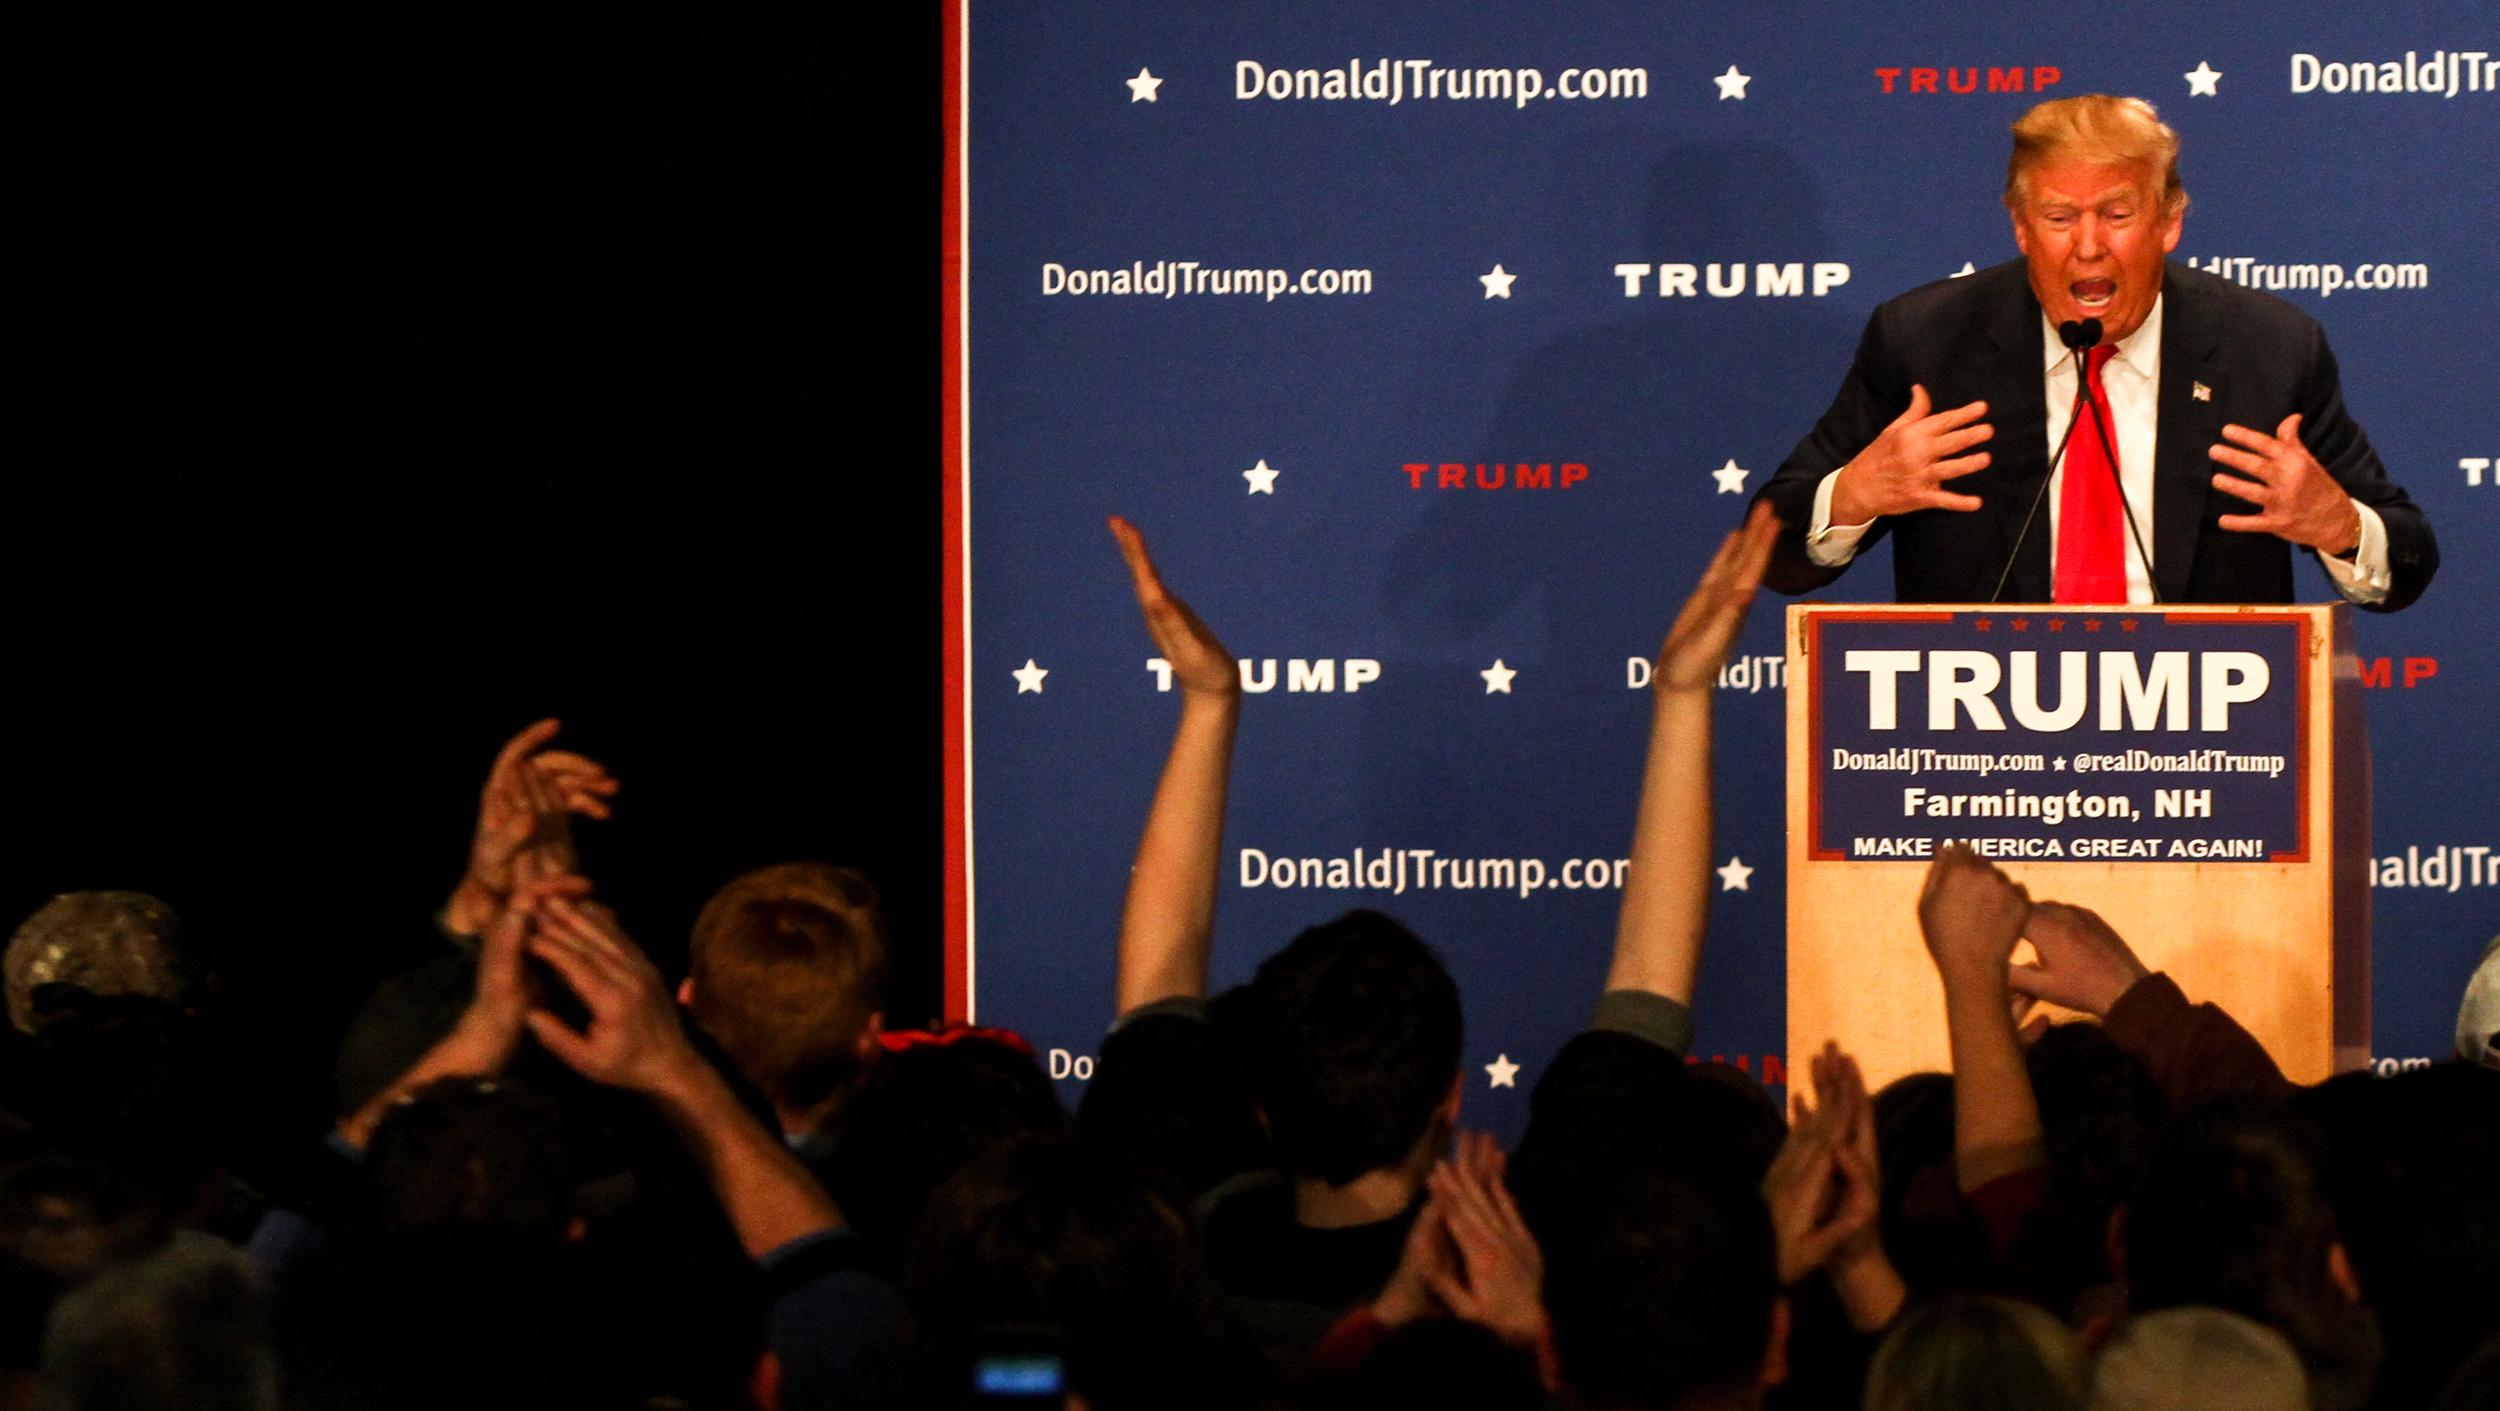 U.S. presidential candidate Donald Trump speaks at a Donald J. Trump for President Rally at Farmington High School, 40 Thayer Dr., Farmington, NH on Jan. 26, 2016.